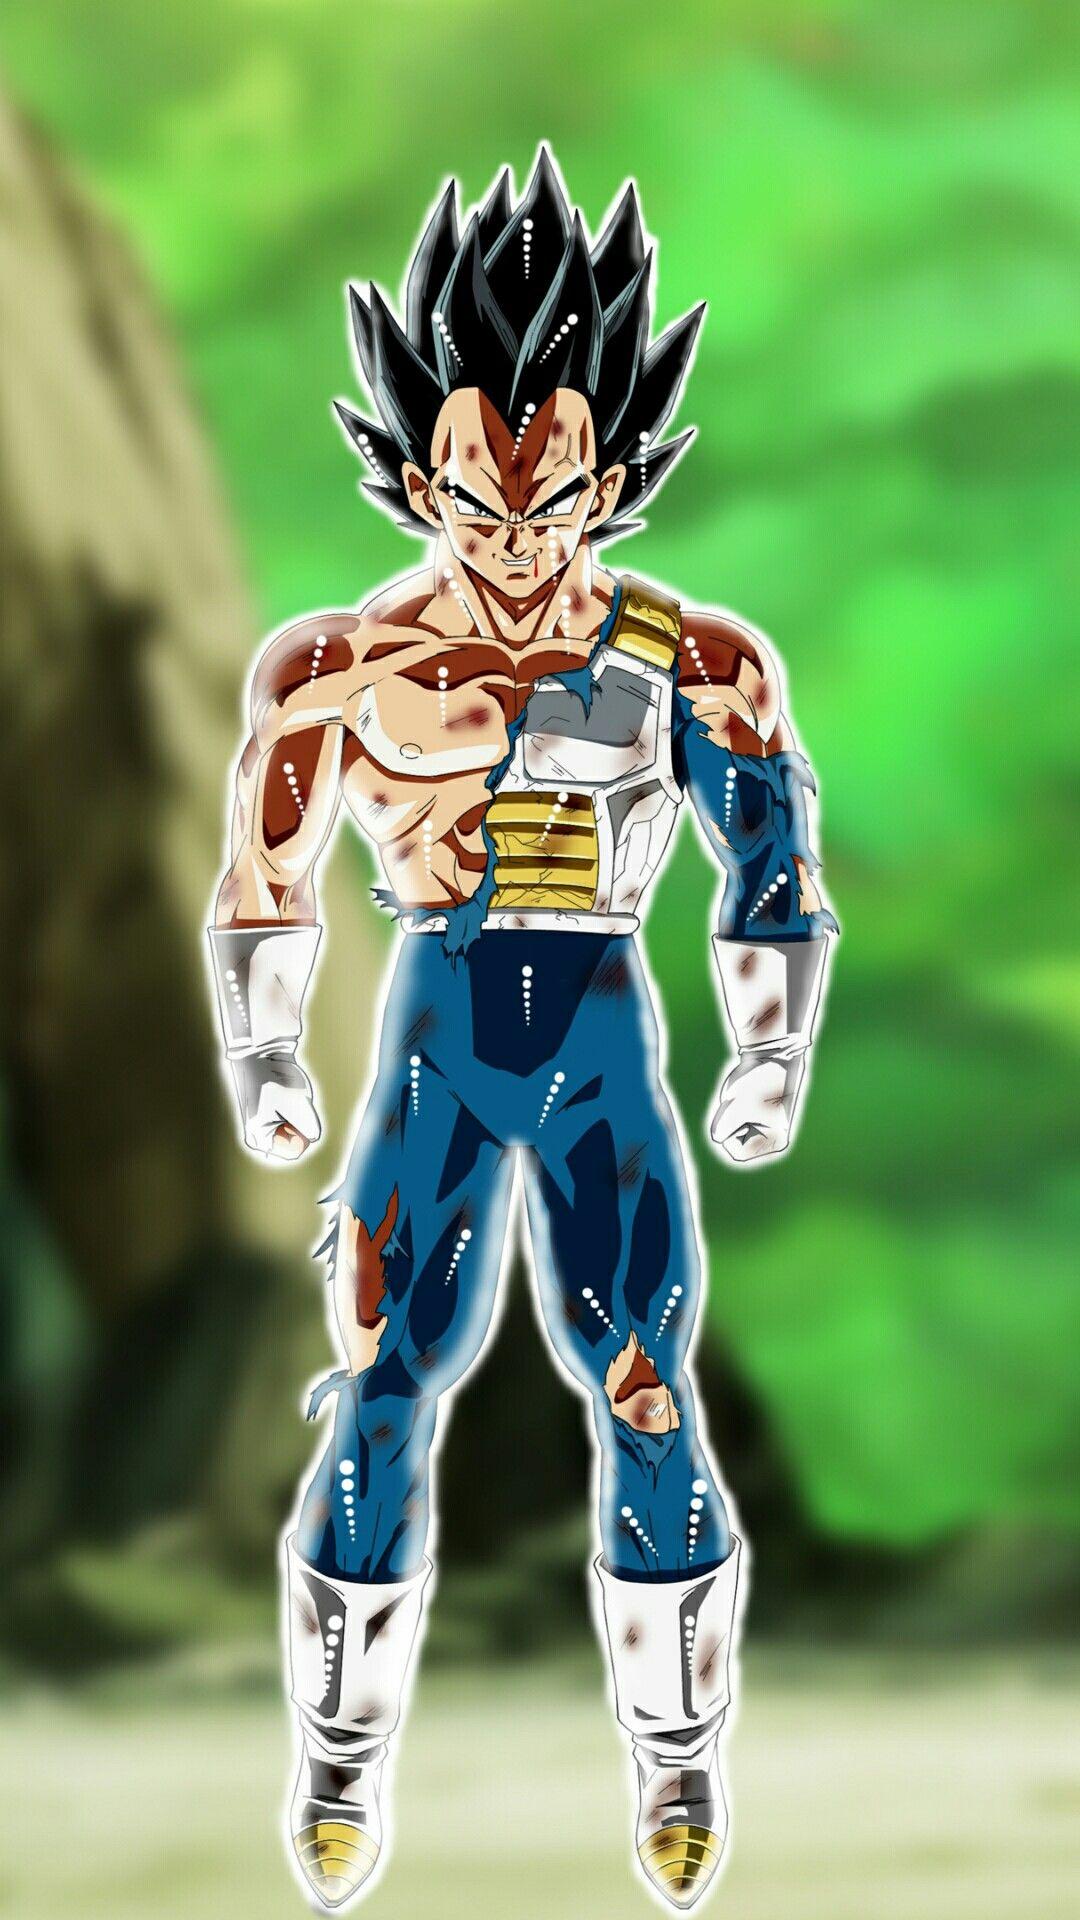 Vegeta Ultra Instinct Personajes De Goku Personajes De Dragon Ball Dragones